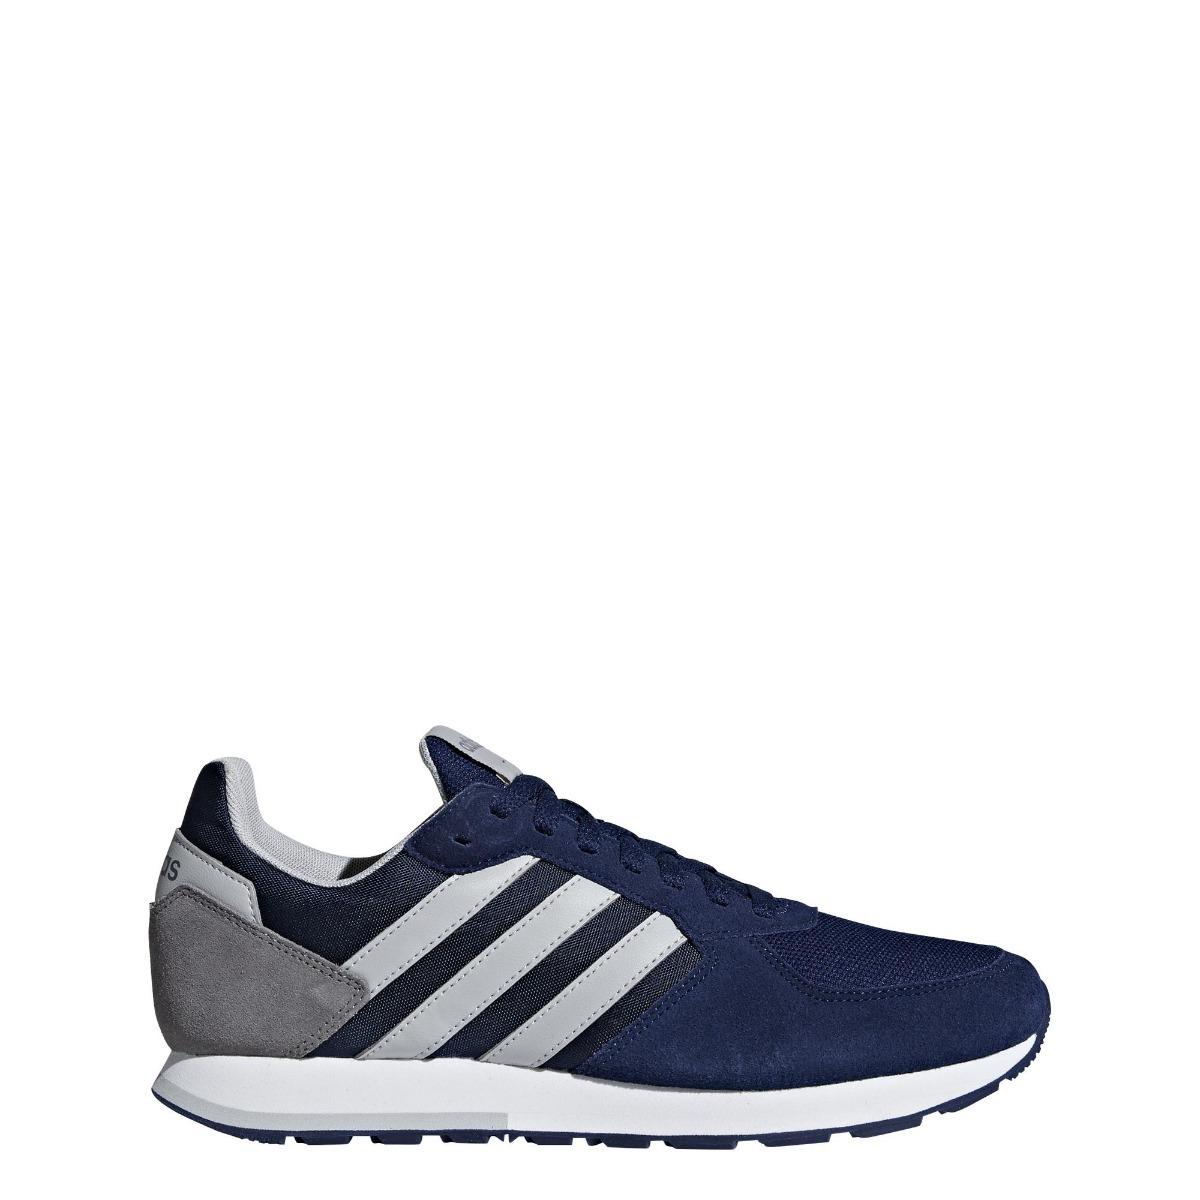 uk availability 800dd 11076 zapatillas lifestyle adidas 8k bl hombre on sports. Cargando zoom.